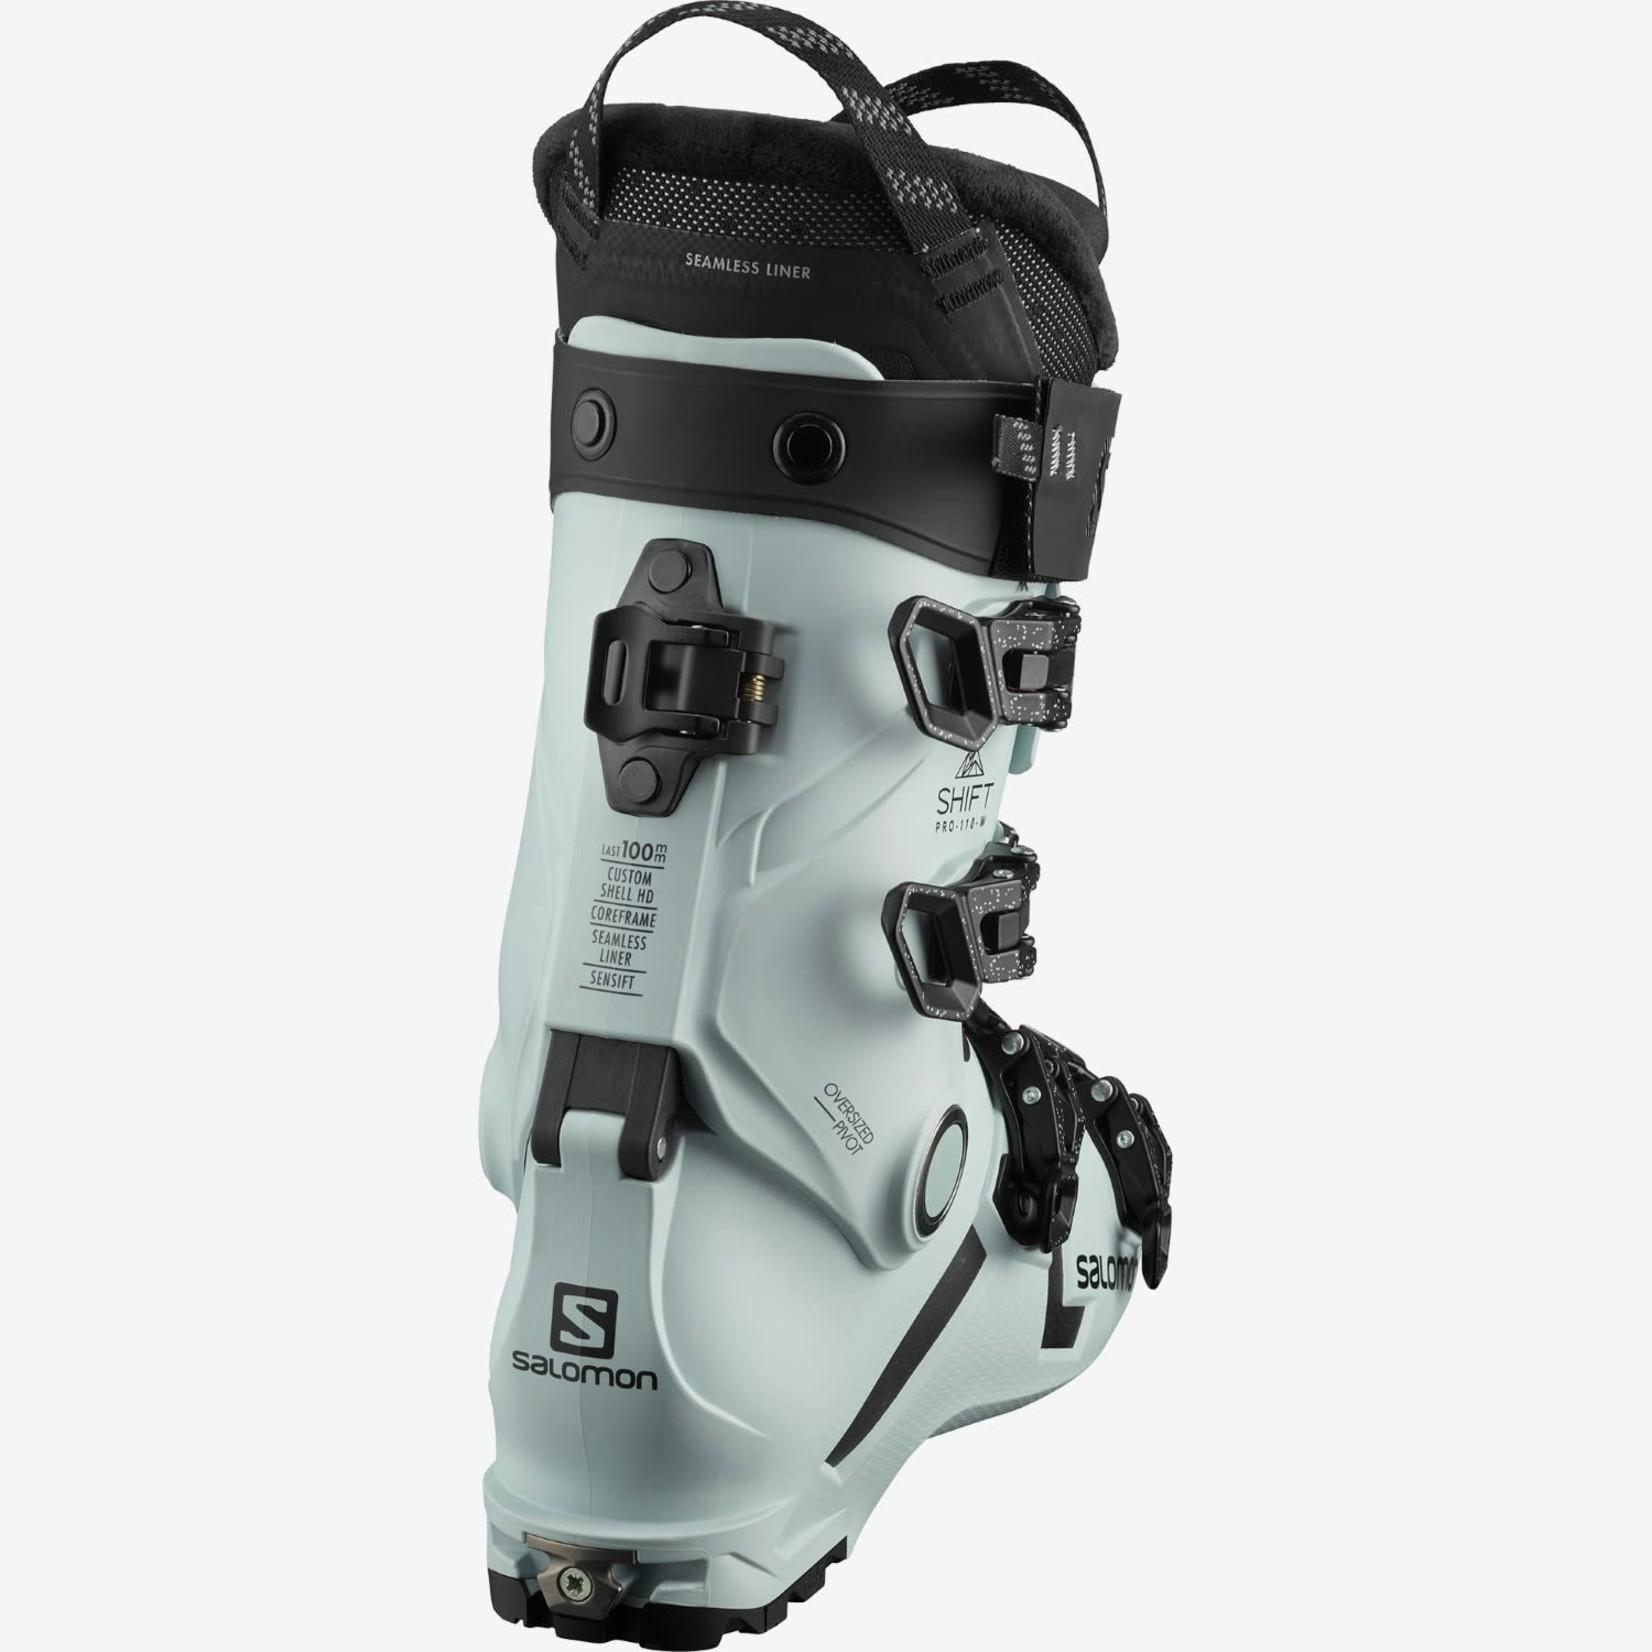 Salomon Botte de ski Salomon Shift Pro 110 - Femme